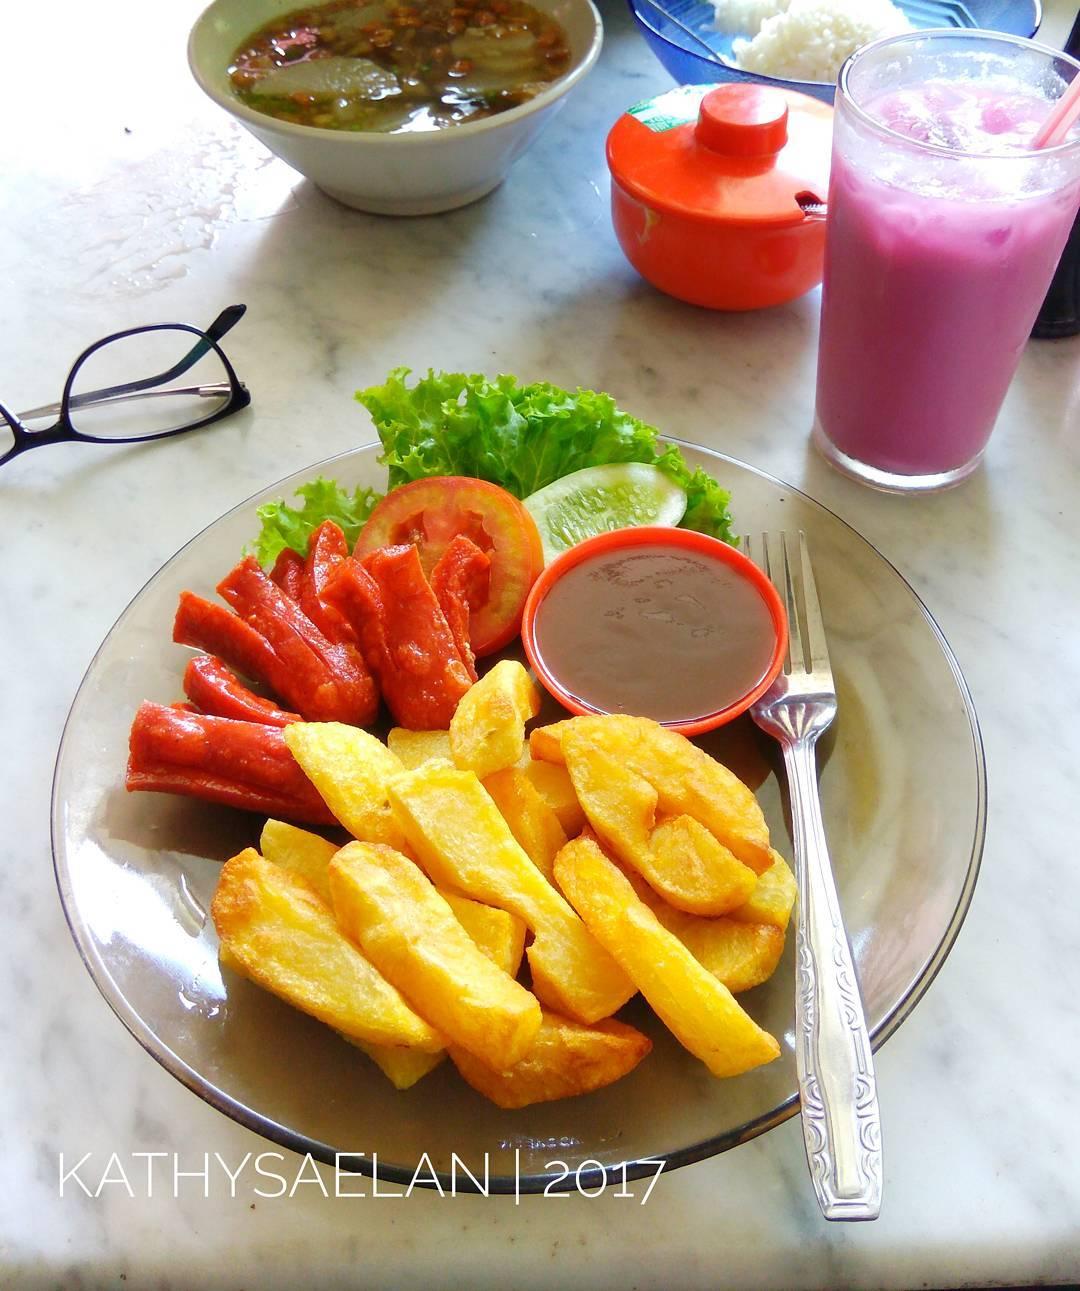 Yoghurt Cisangkuy, Yoghurt Cisangkuy Bandung, Bandung, Kota Bandung, Dolan Dolen, Dolaners Yoghurt Cisangkuy by kathysaelan - Dolan Dolen